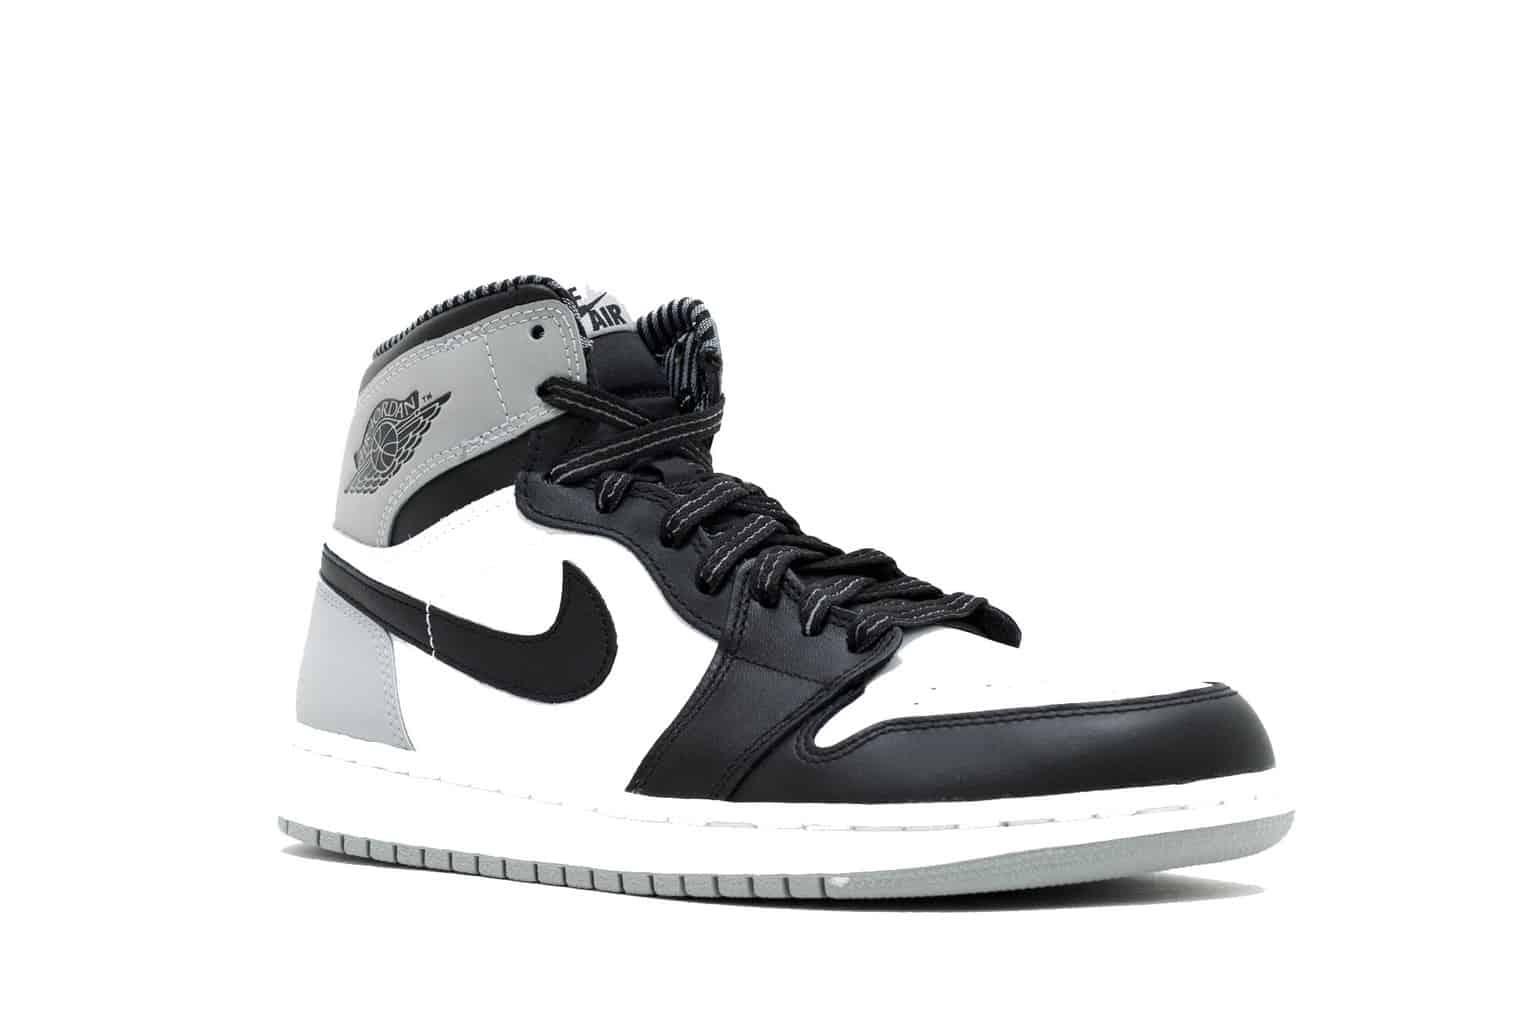 Upcoming Sneaker Drops: January 2019